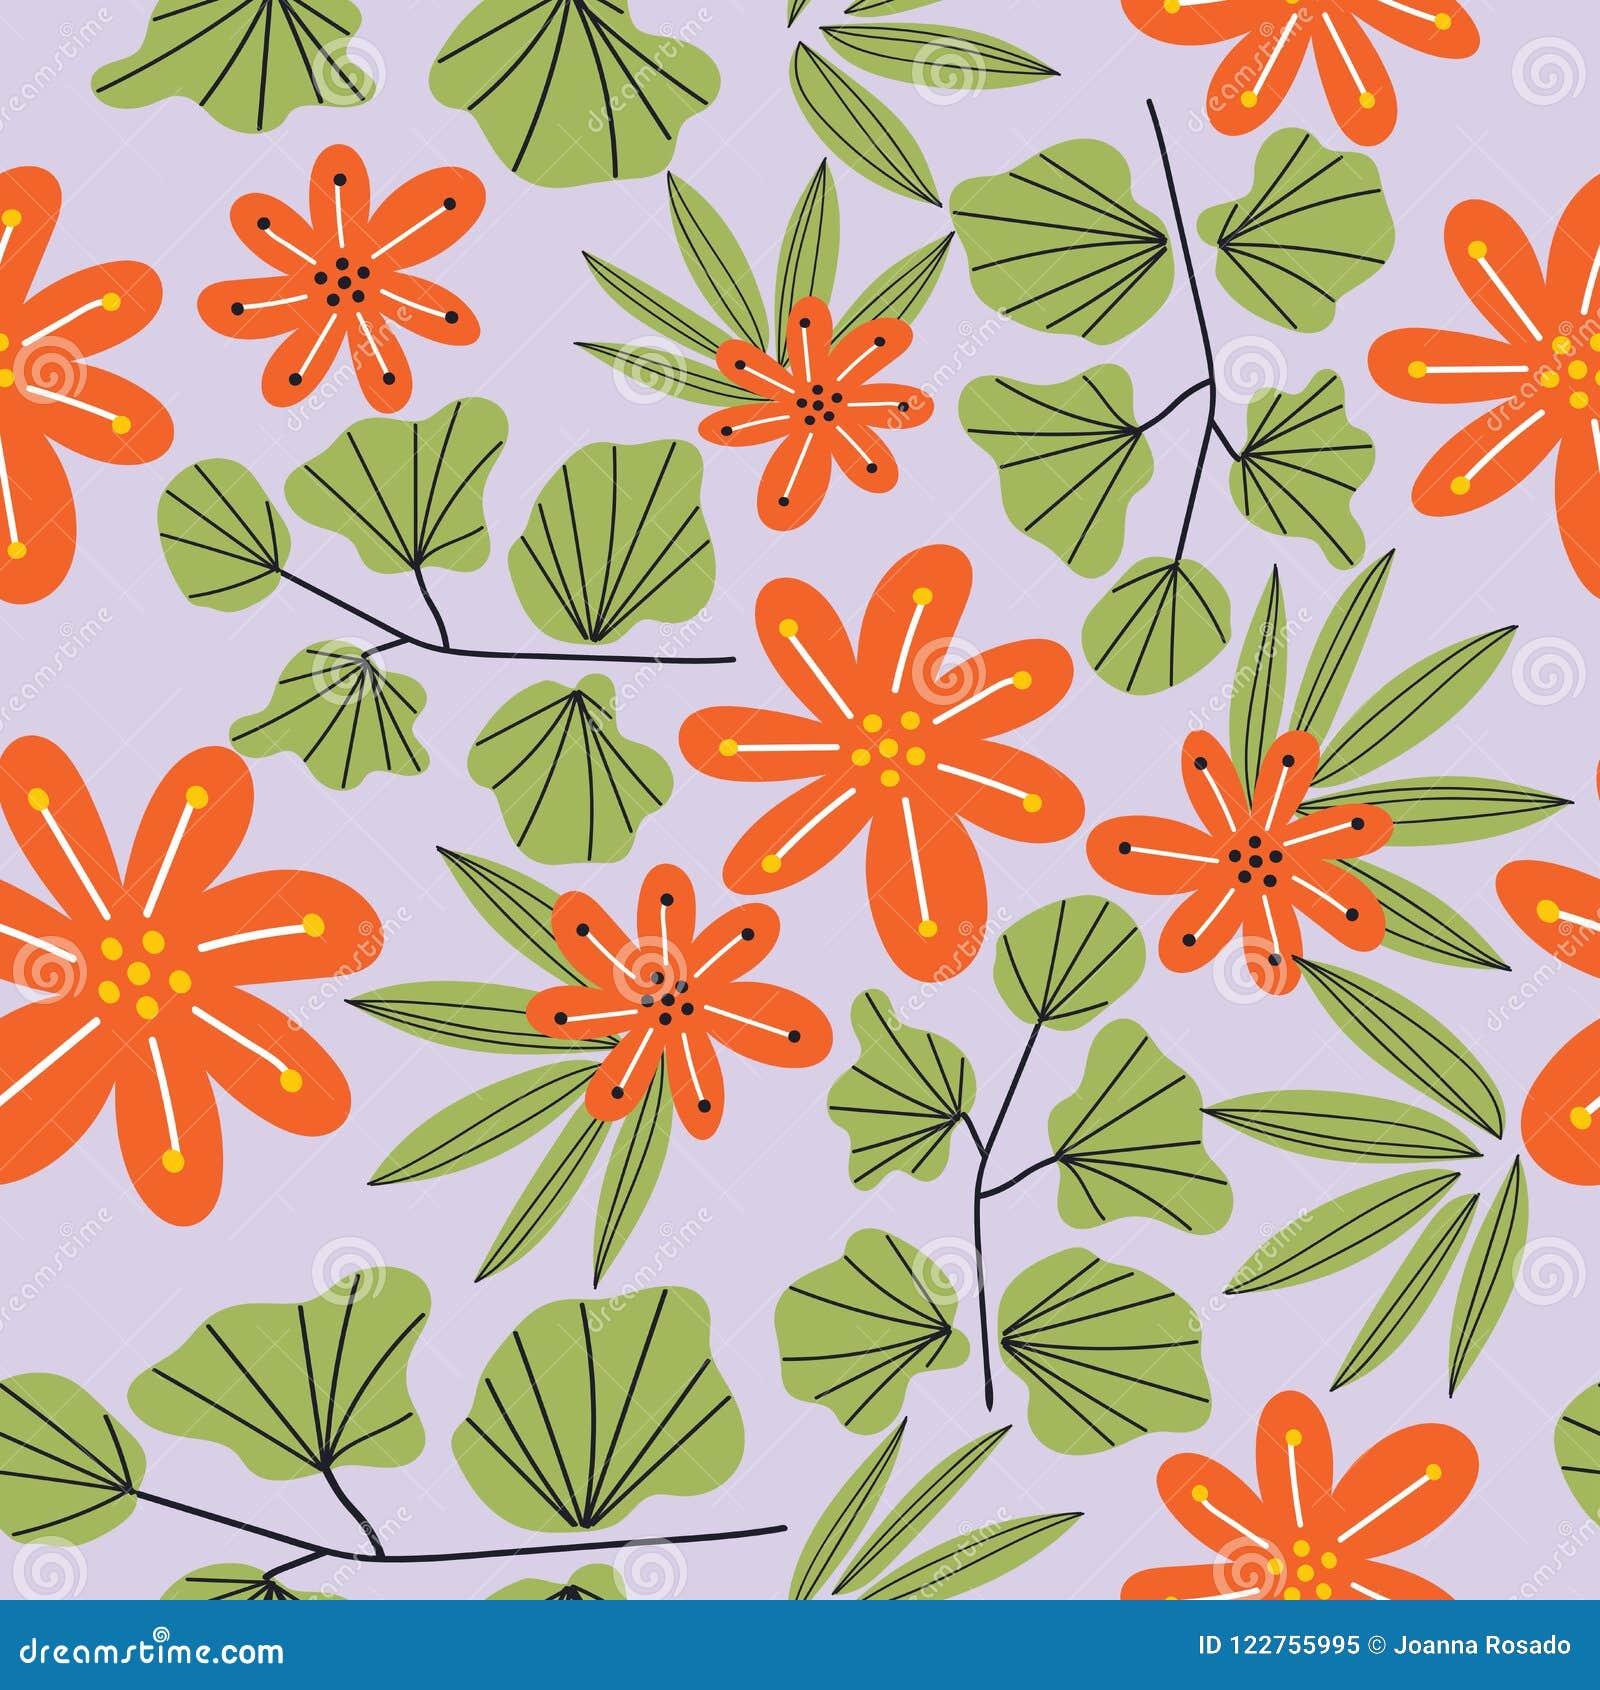 Botanical Floral Seamless Pattern Vector Flower Print Floral